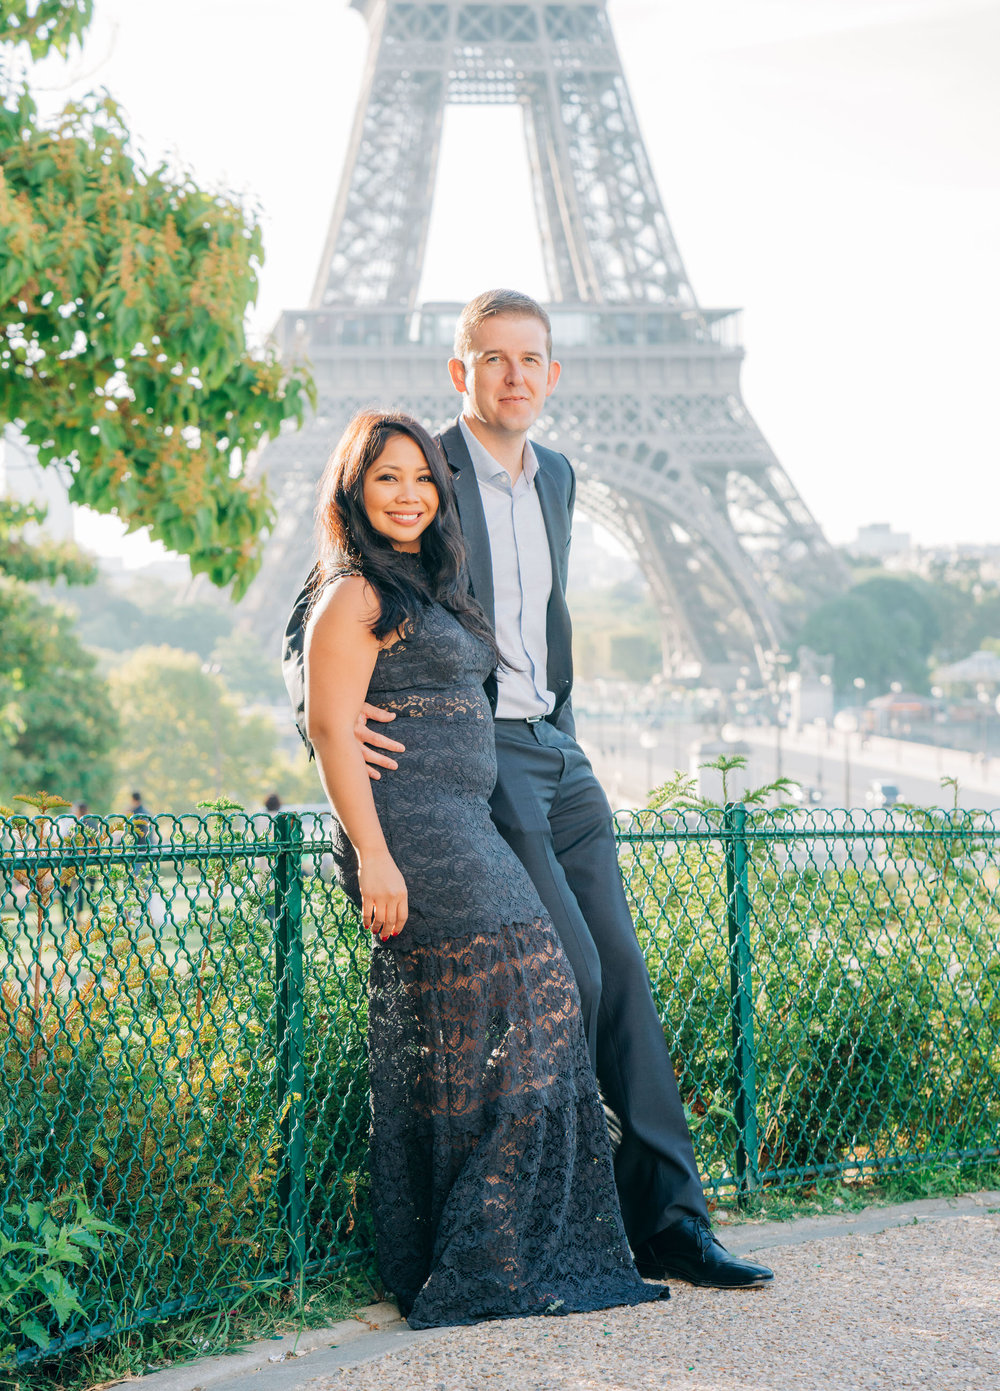 romantic couples anniversary photo shoot at trocadero eiffel tower paris france